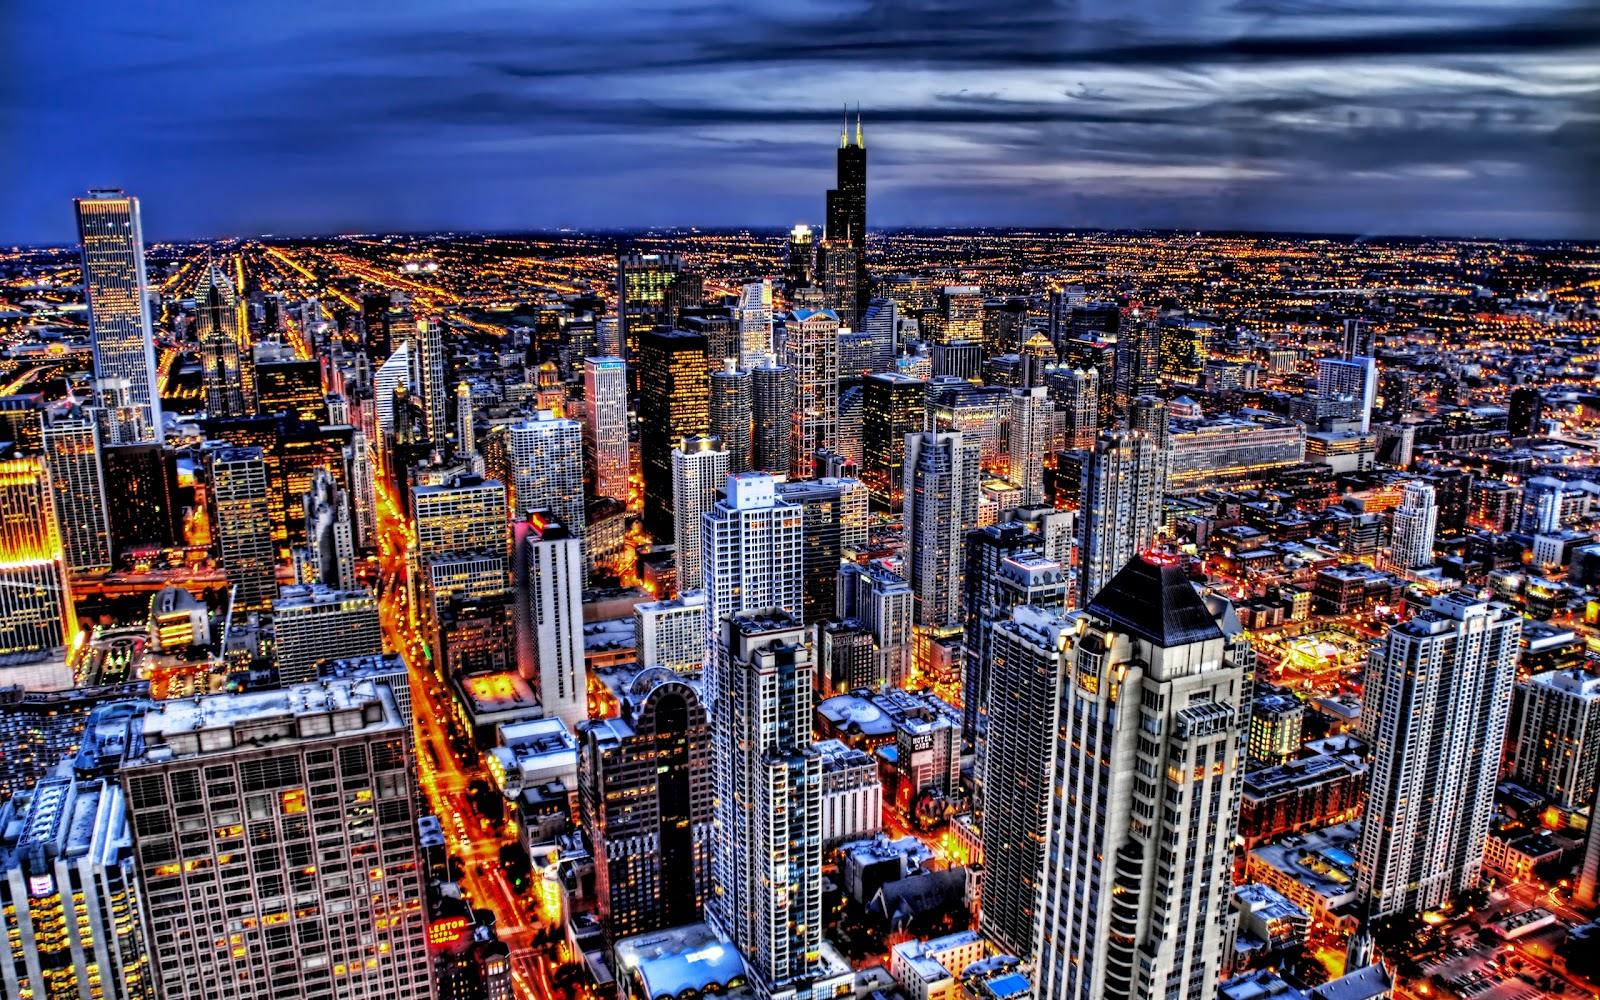 City lights HD Wallpapers Hd Wallpaper 1600x1000